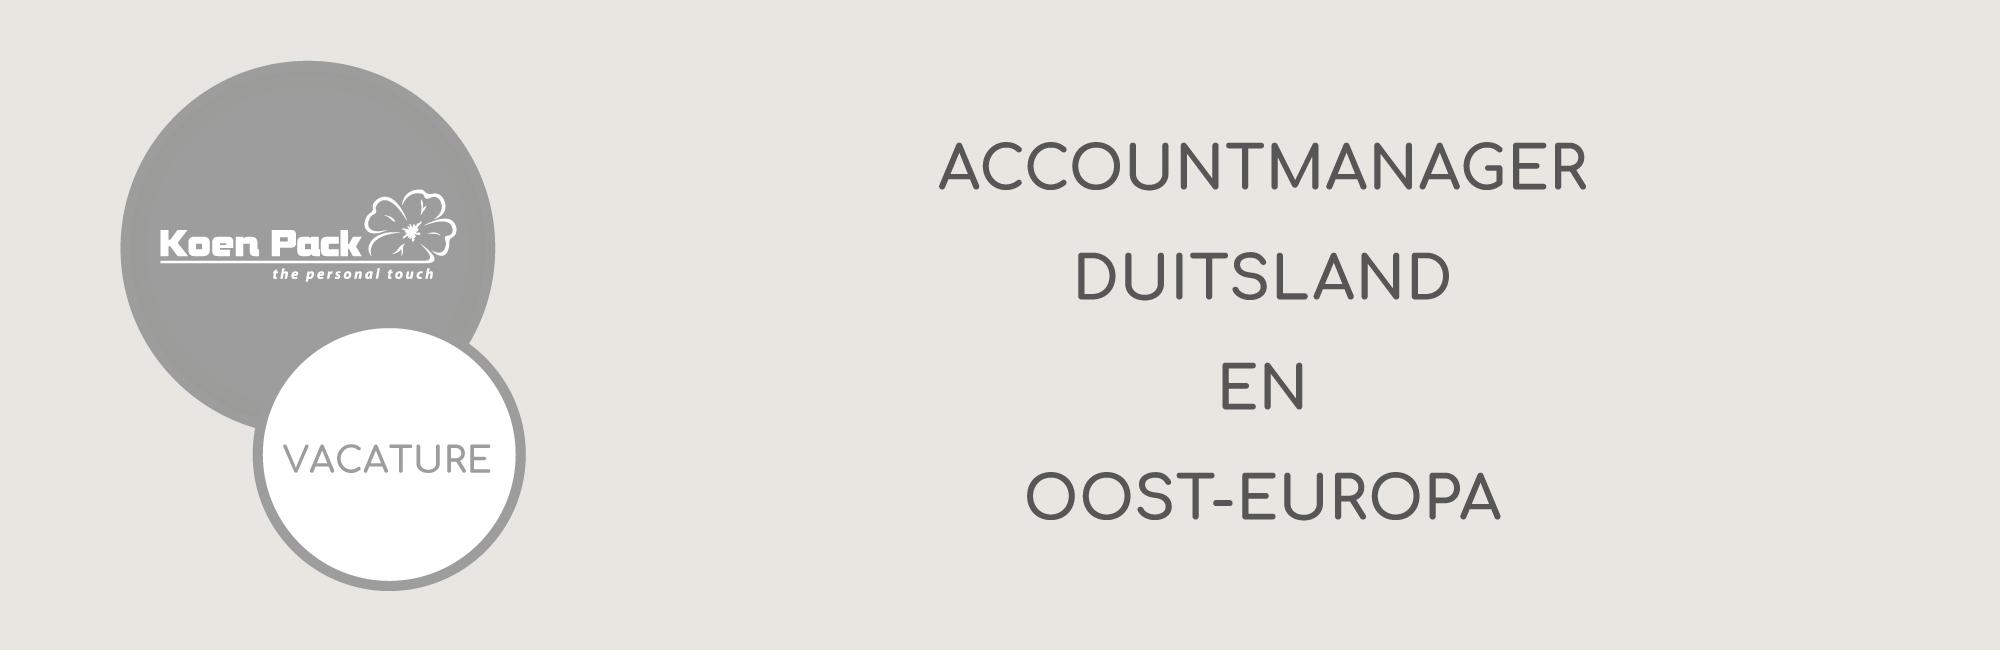 Accountmanager Duitsland en Oost-Europa